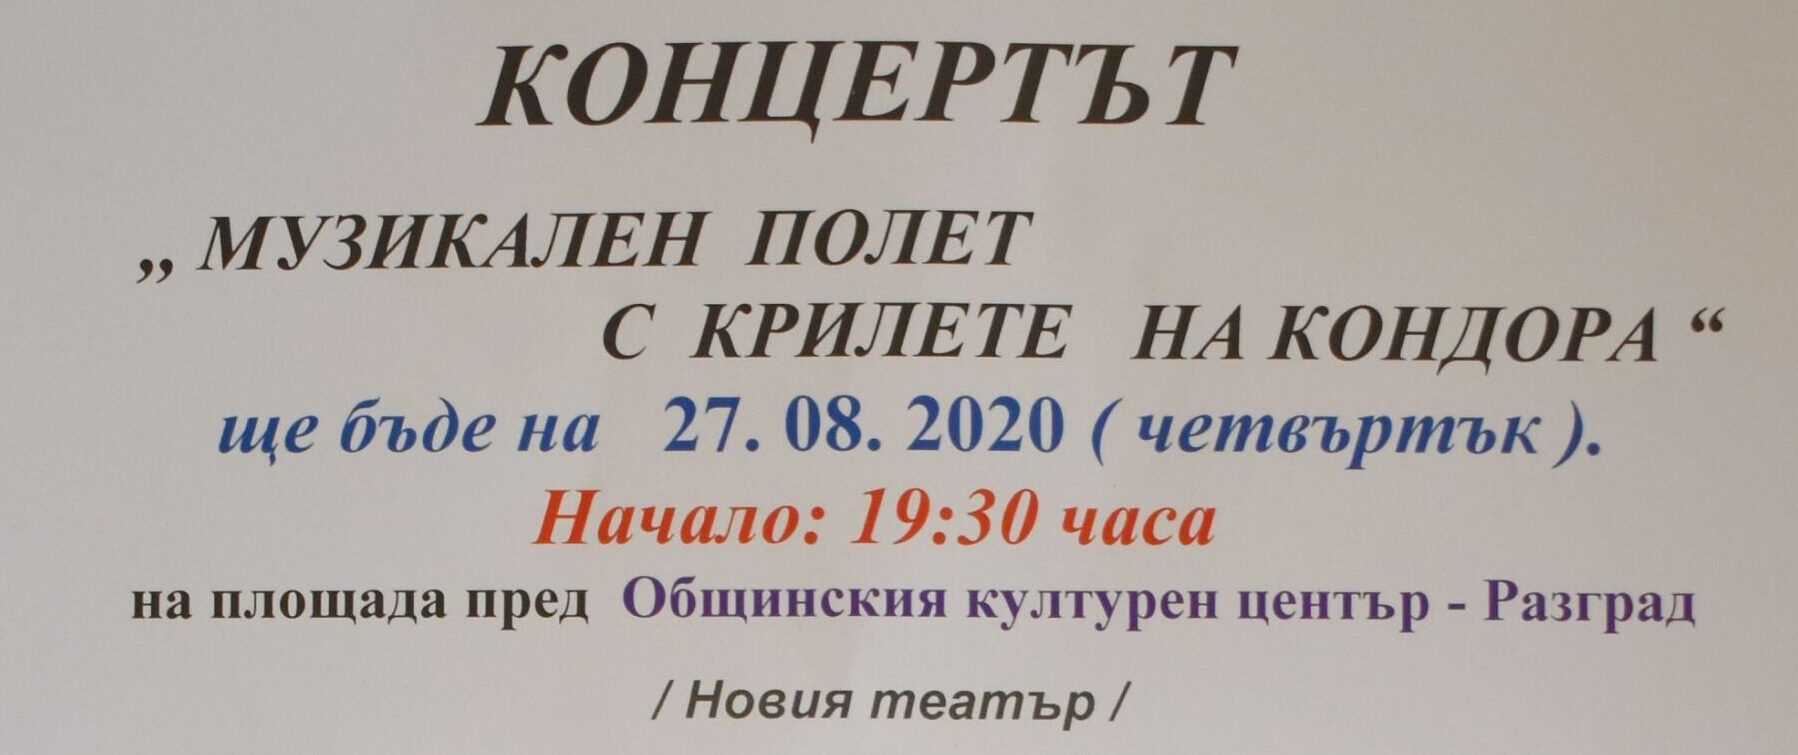 Разградчанин дарява свой солов концерт на родния си гр ...